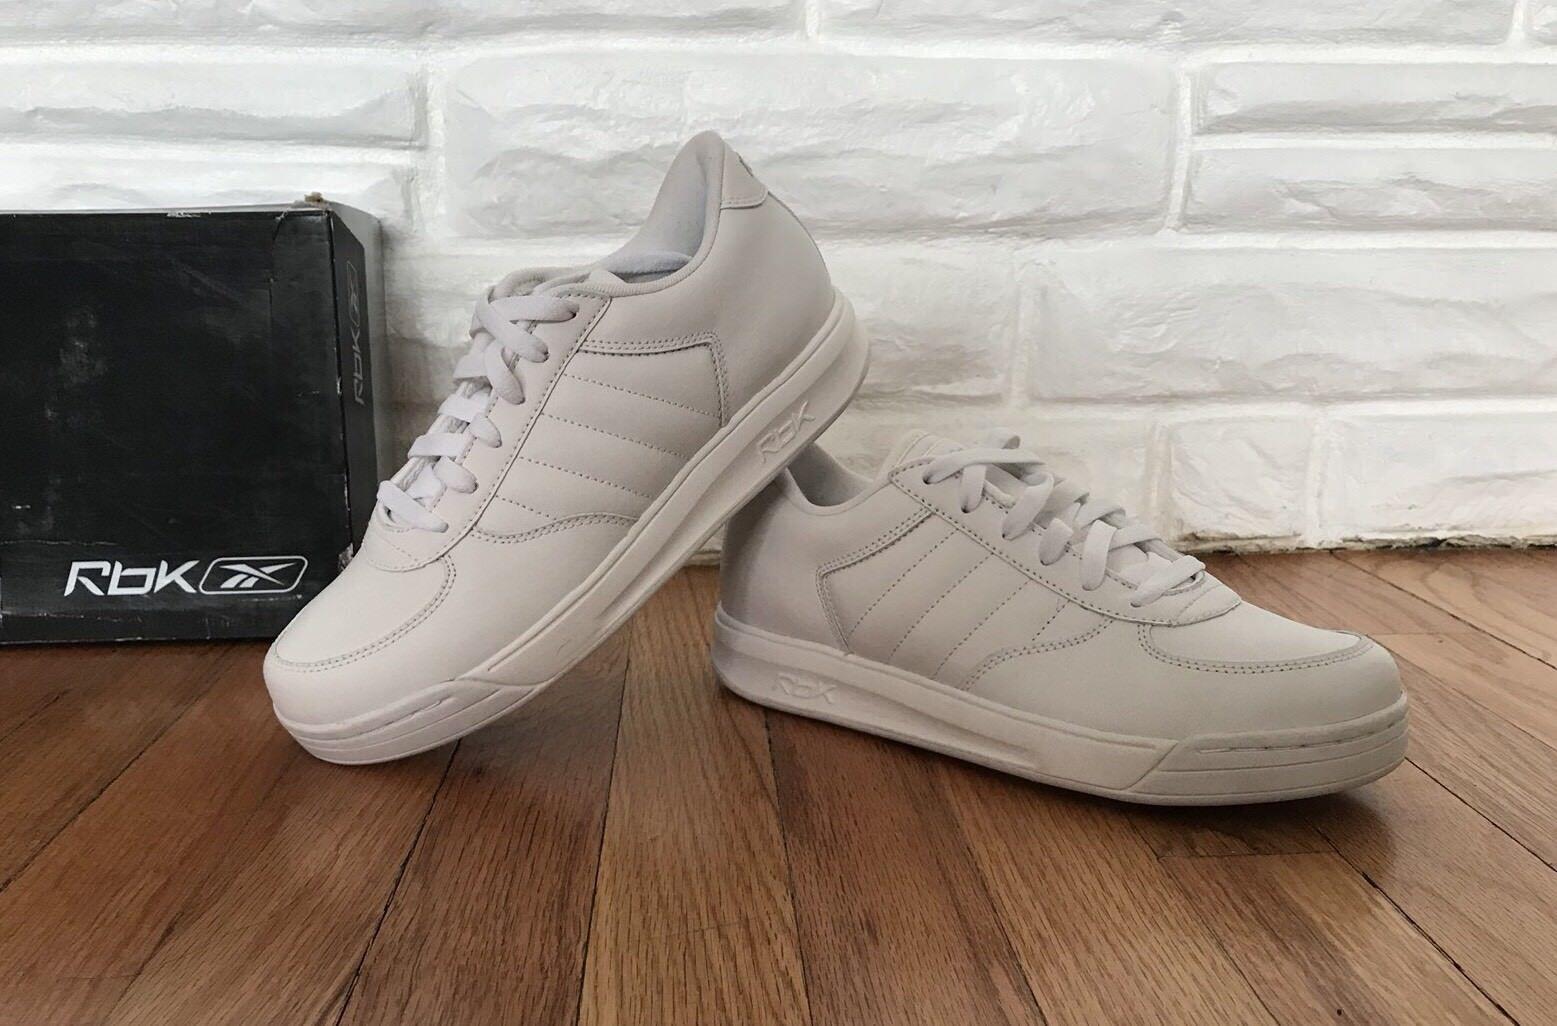 Reebok S Carter Bball Low White/Gray Size 6 Shoe